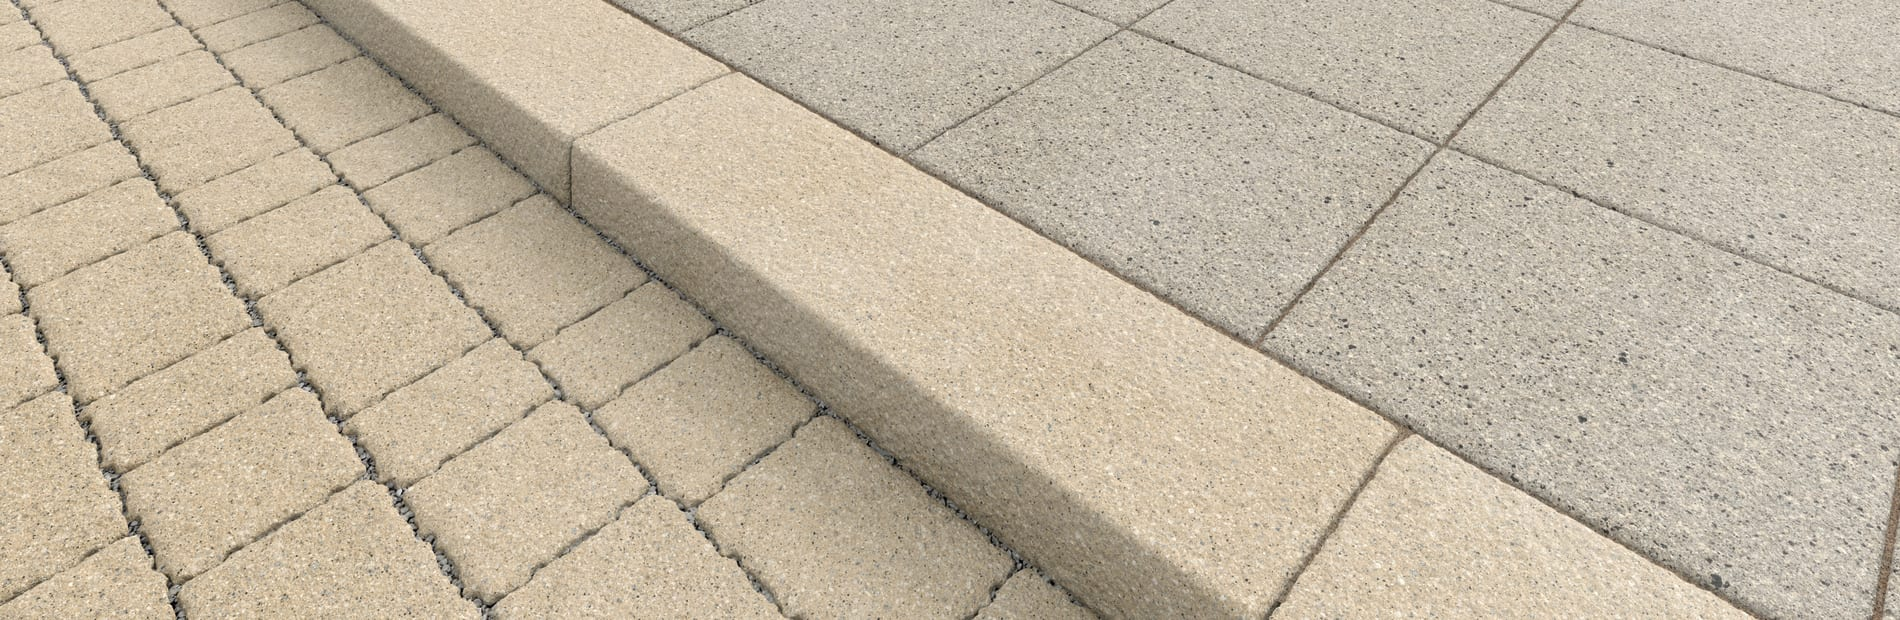 conservation x kerb in cream conservation x priora block in cream and conservation x paving in silver grey textured